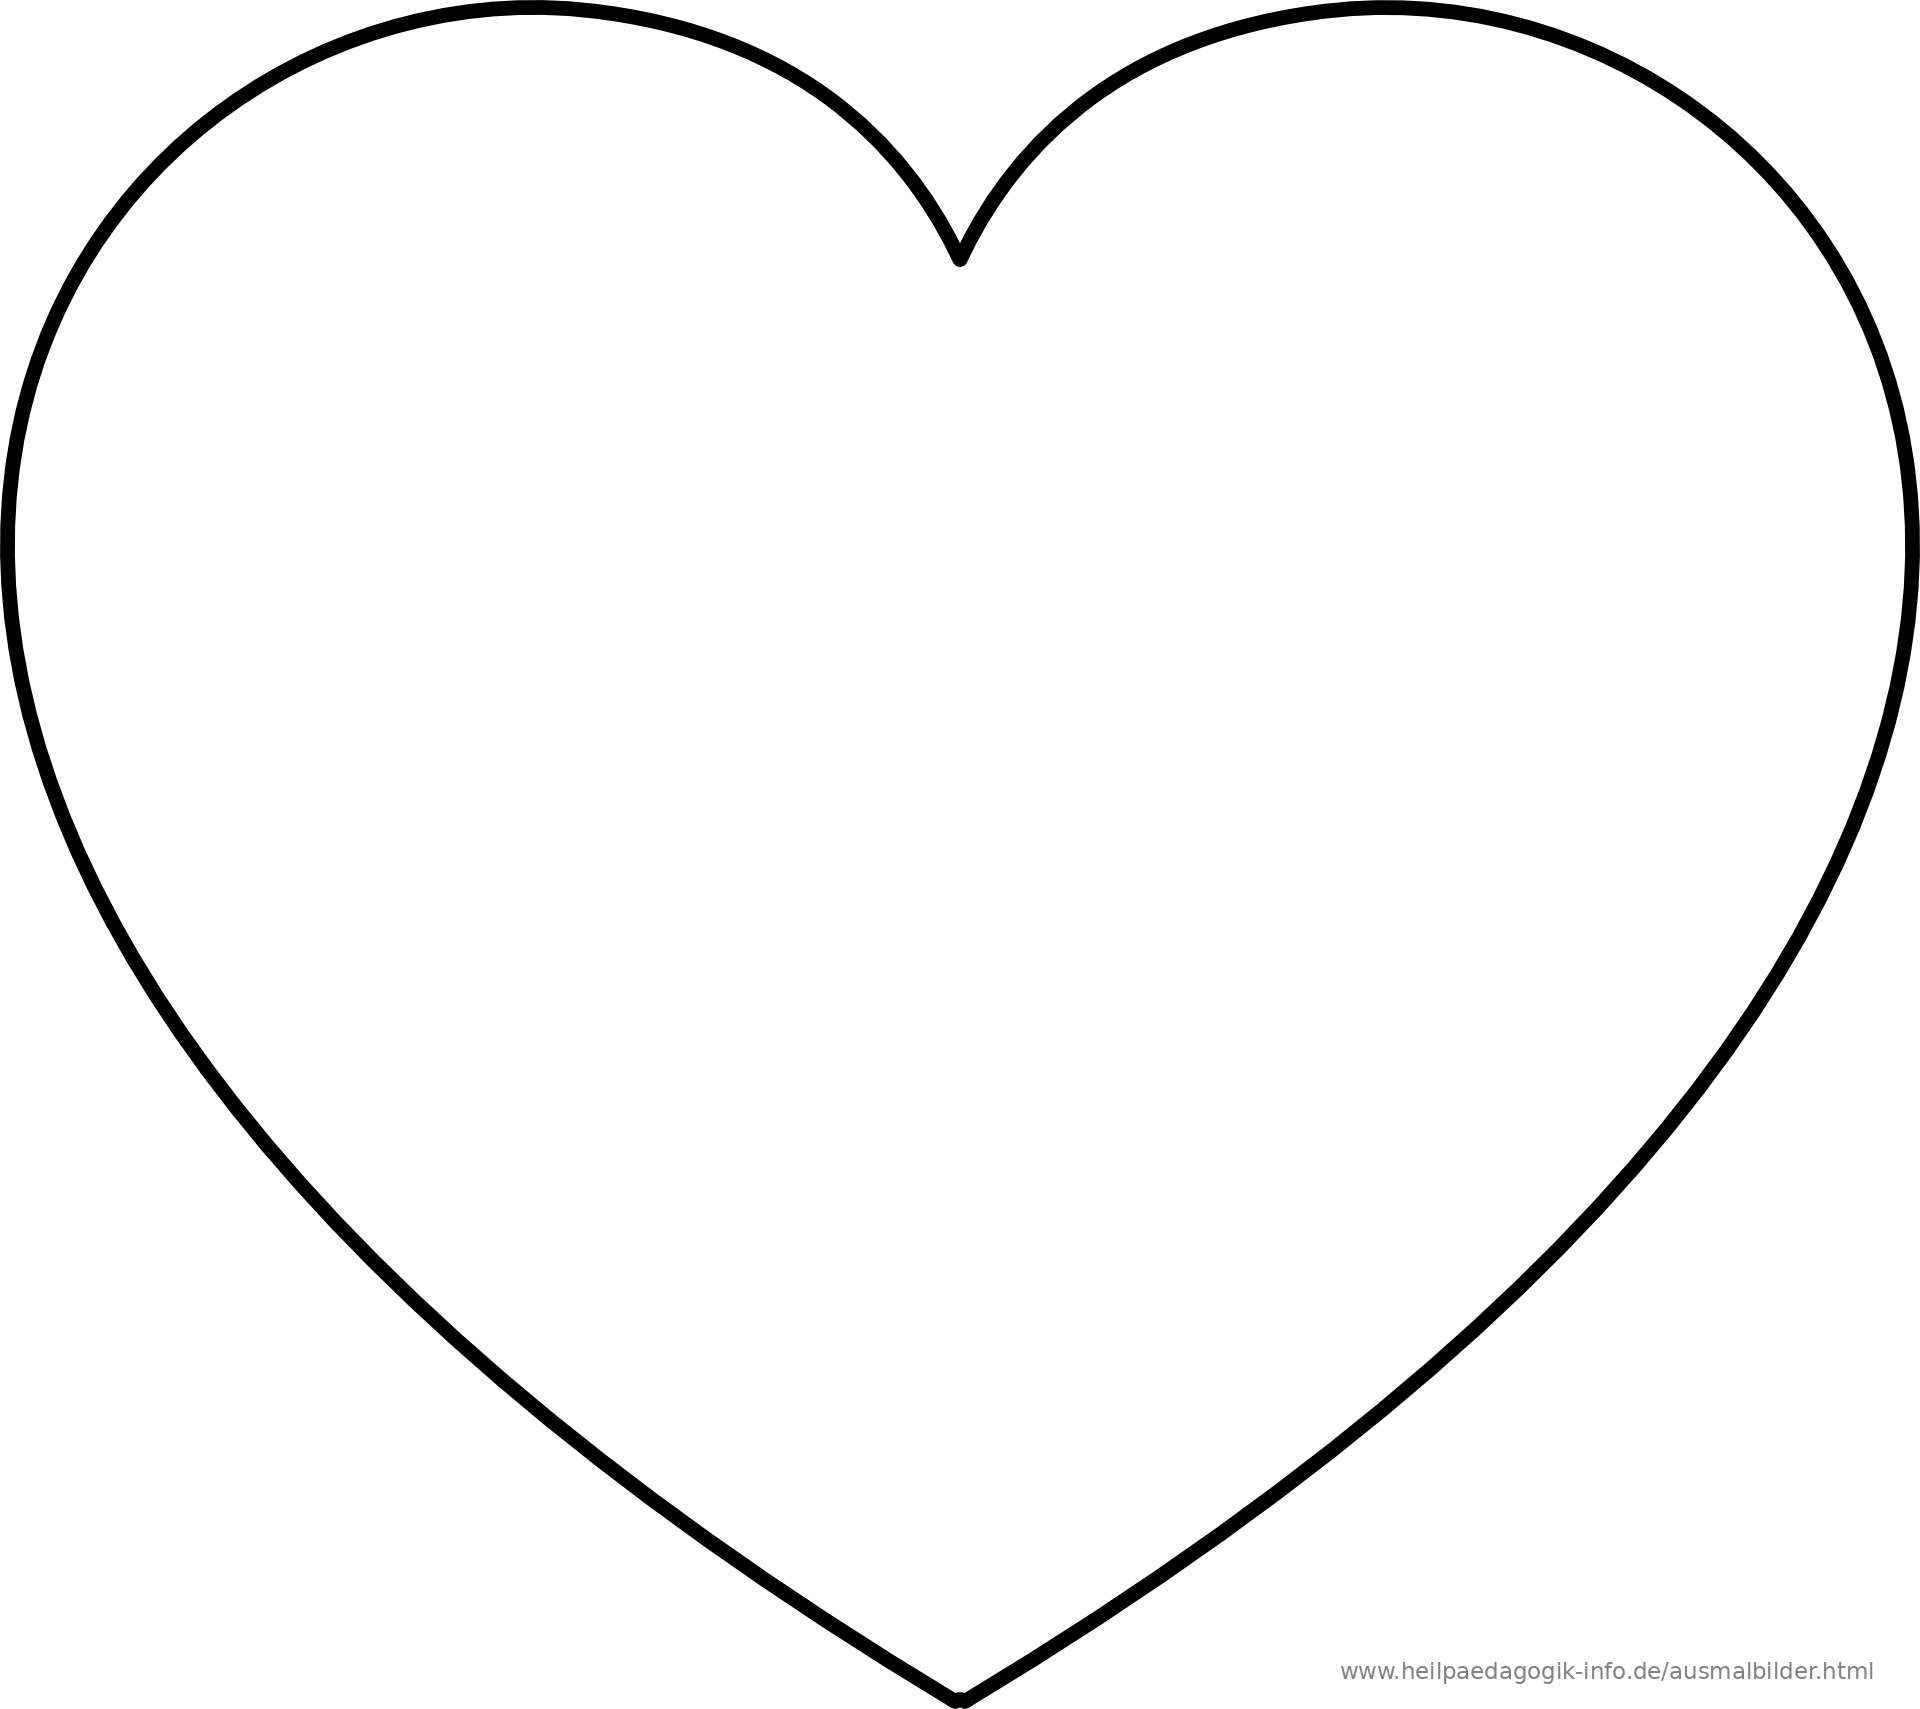 Ausmalbilder Herzen